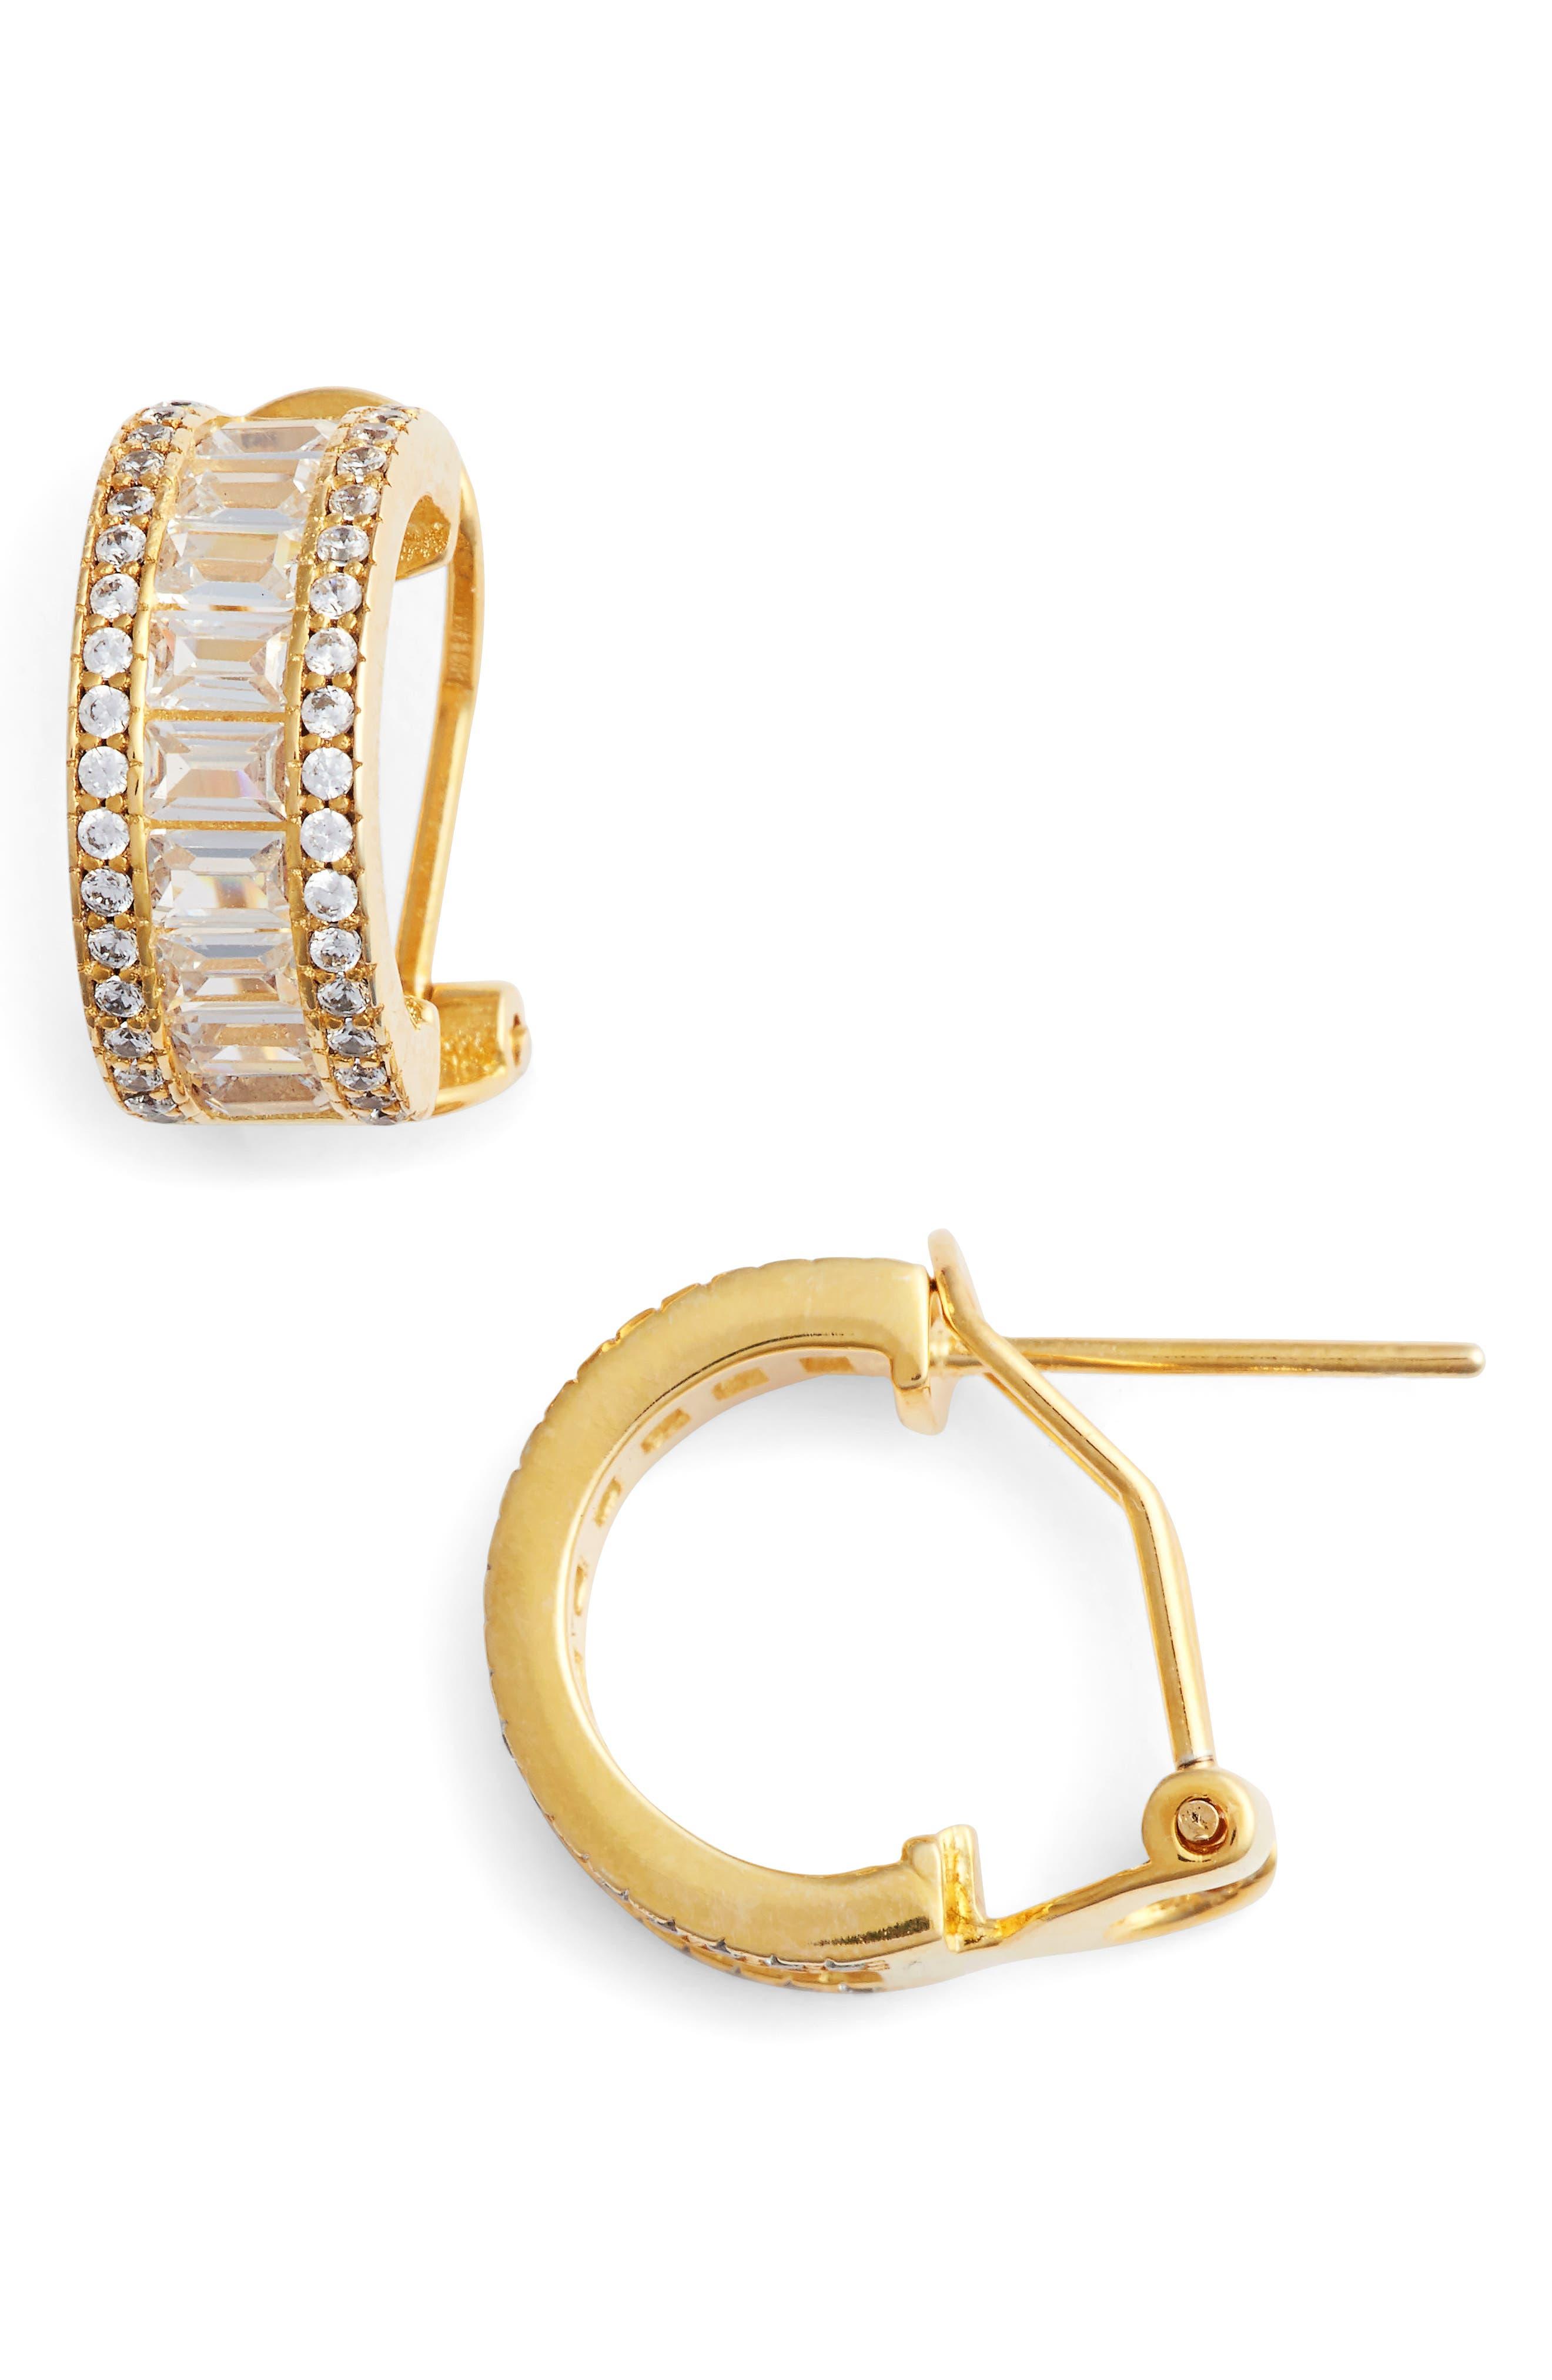 Small Baguette Pavé Hoop Earrings,                         Main,                         color, Gold/ White Cz